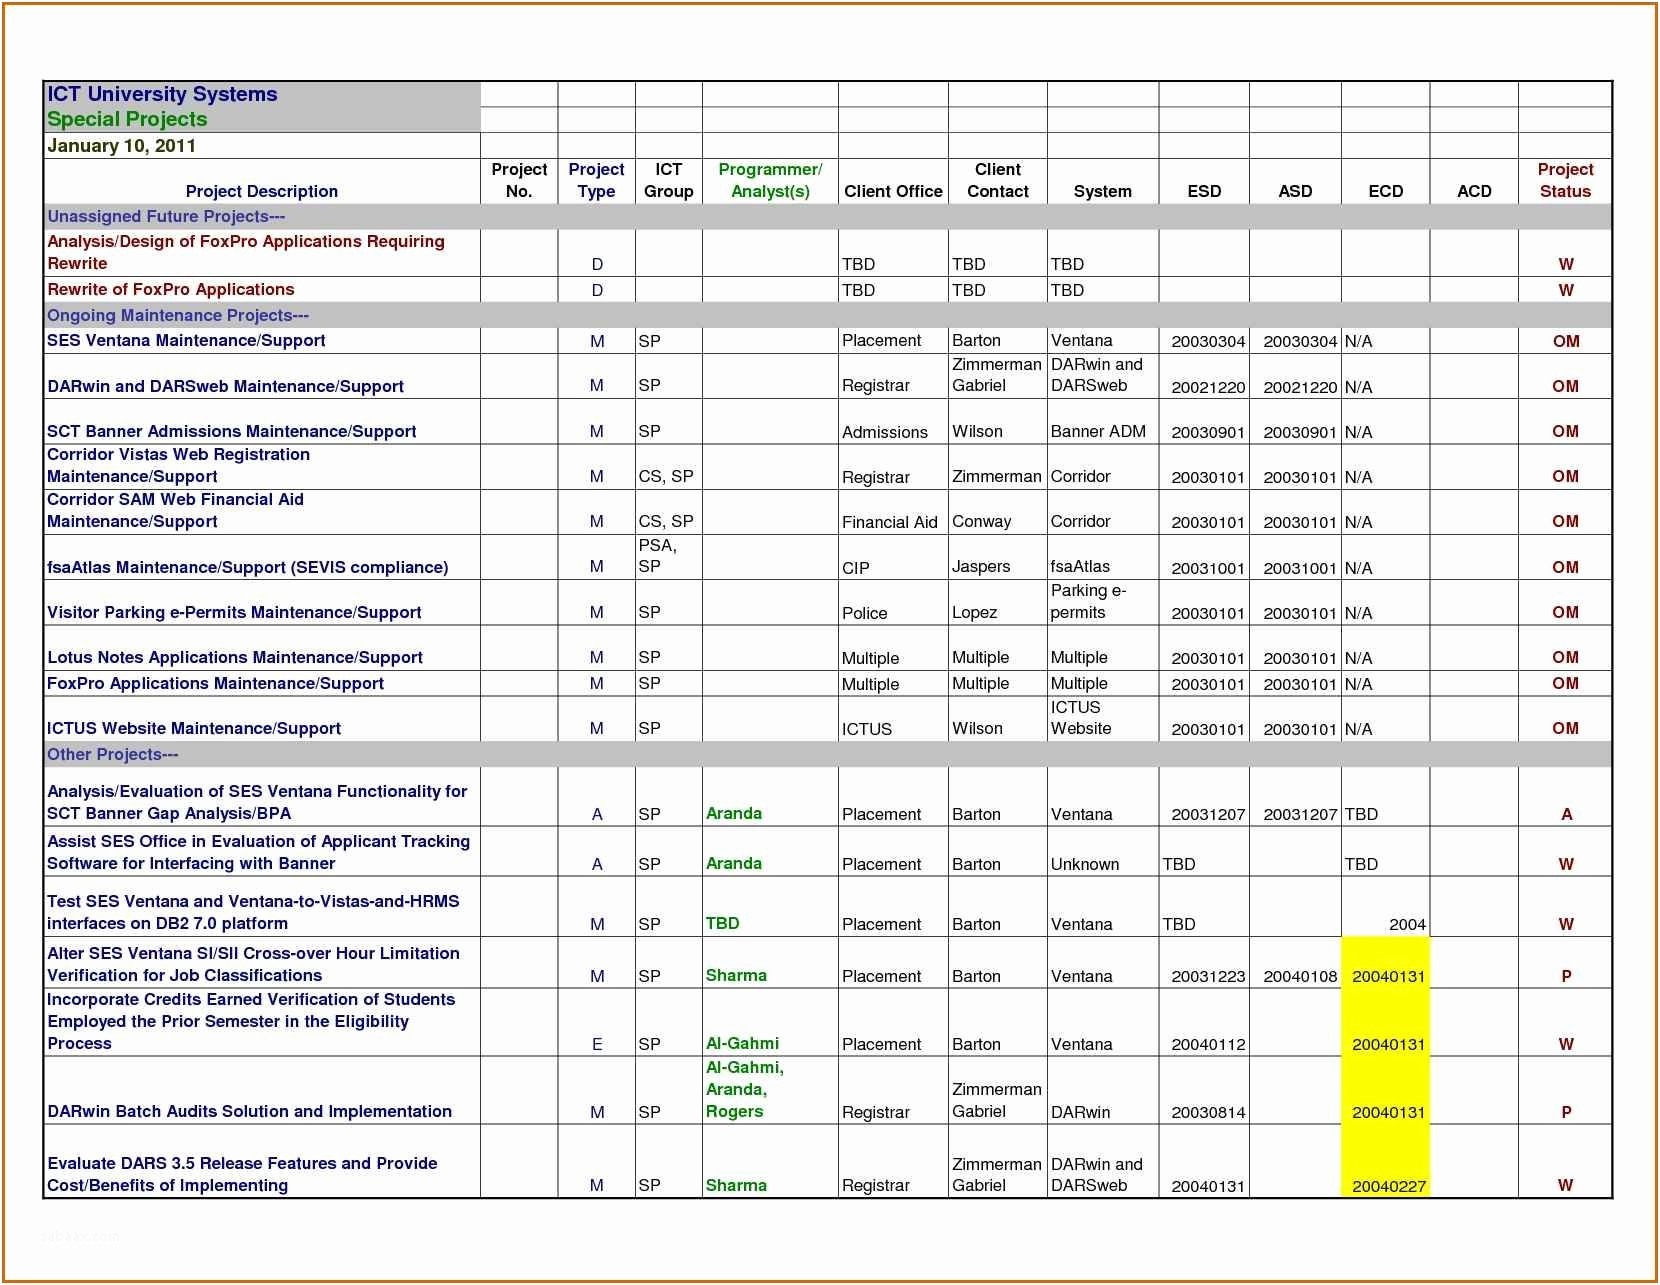 How To Open Google Spreadsheet In Projectanagement How To Open Google Spreadsheet For Perfect